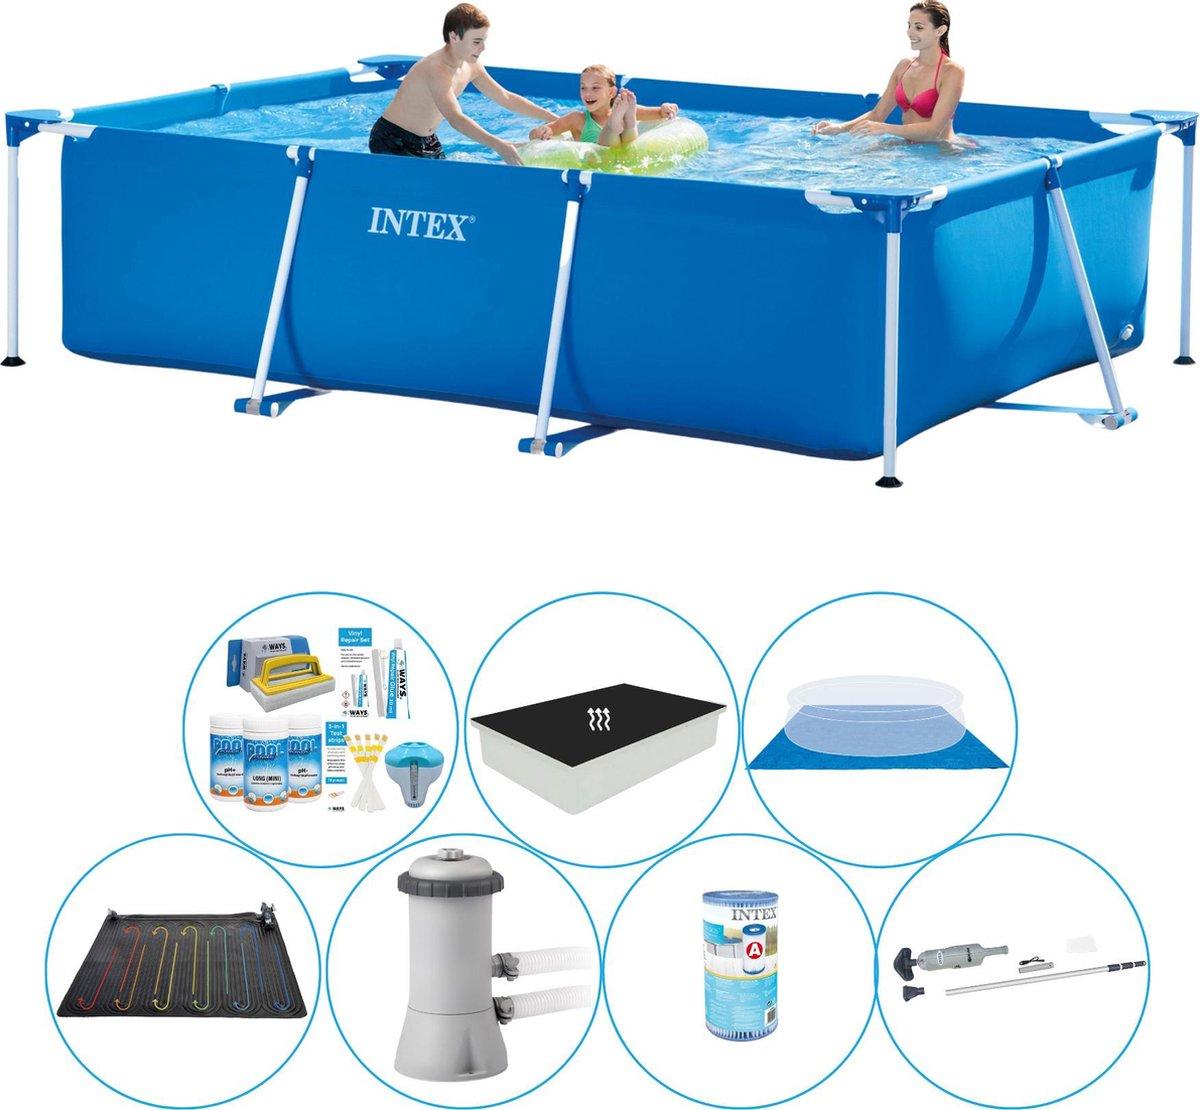 Intex Frame Pool Rechthoekig 300x200x75 cm - Zwembad Super Set